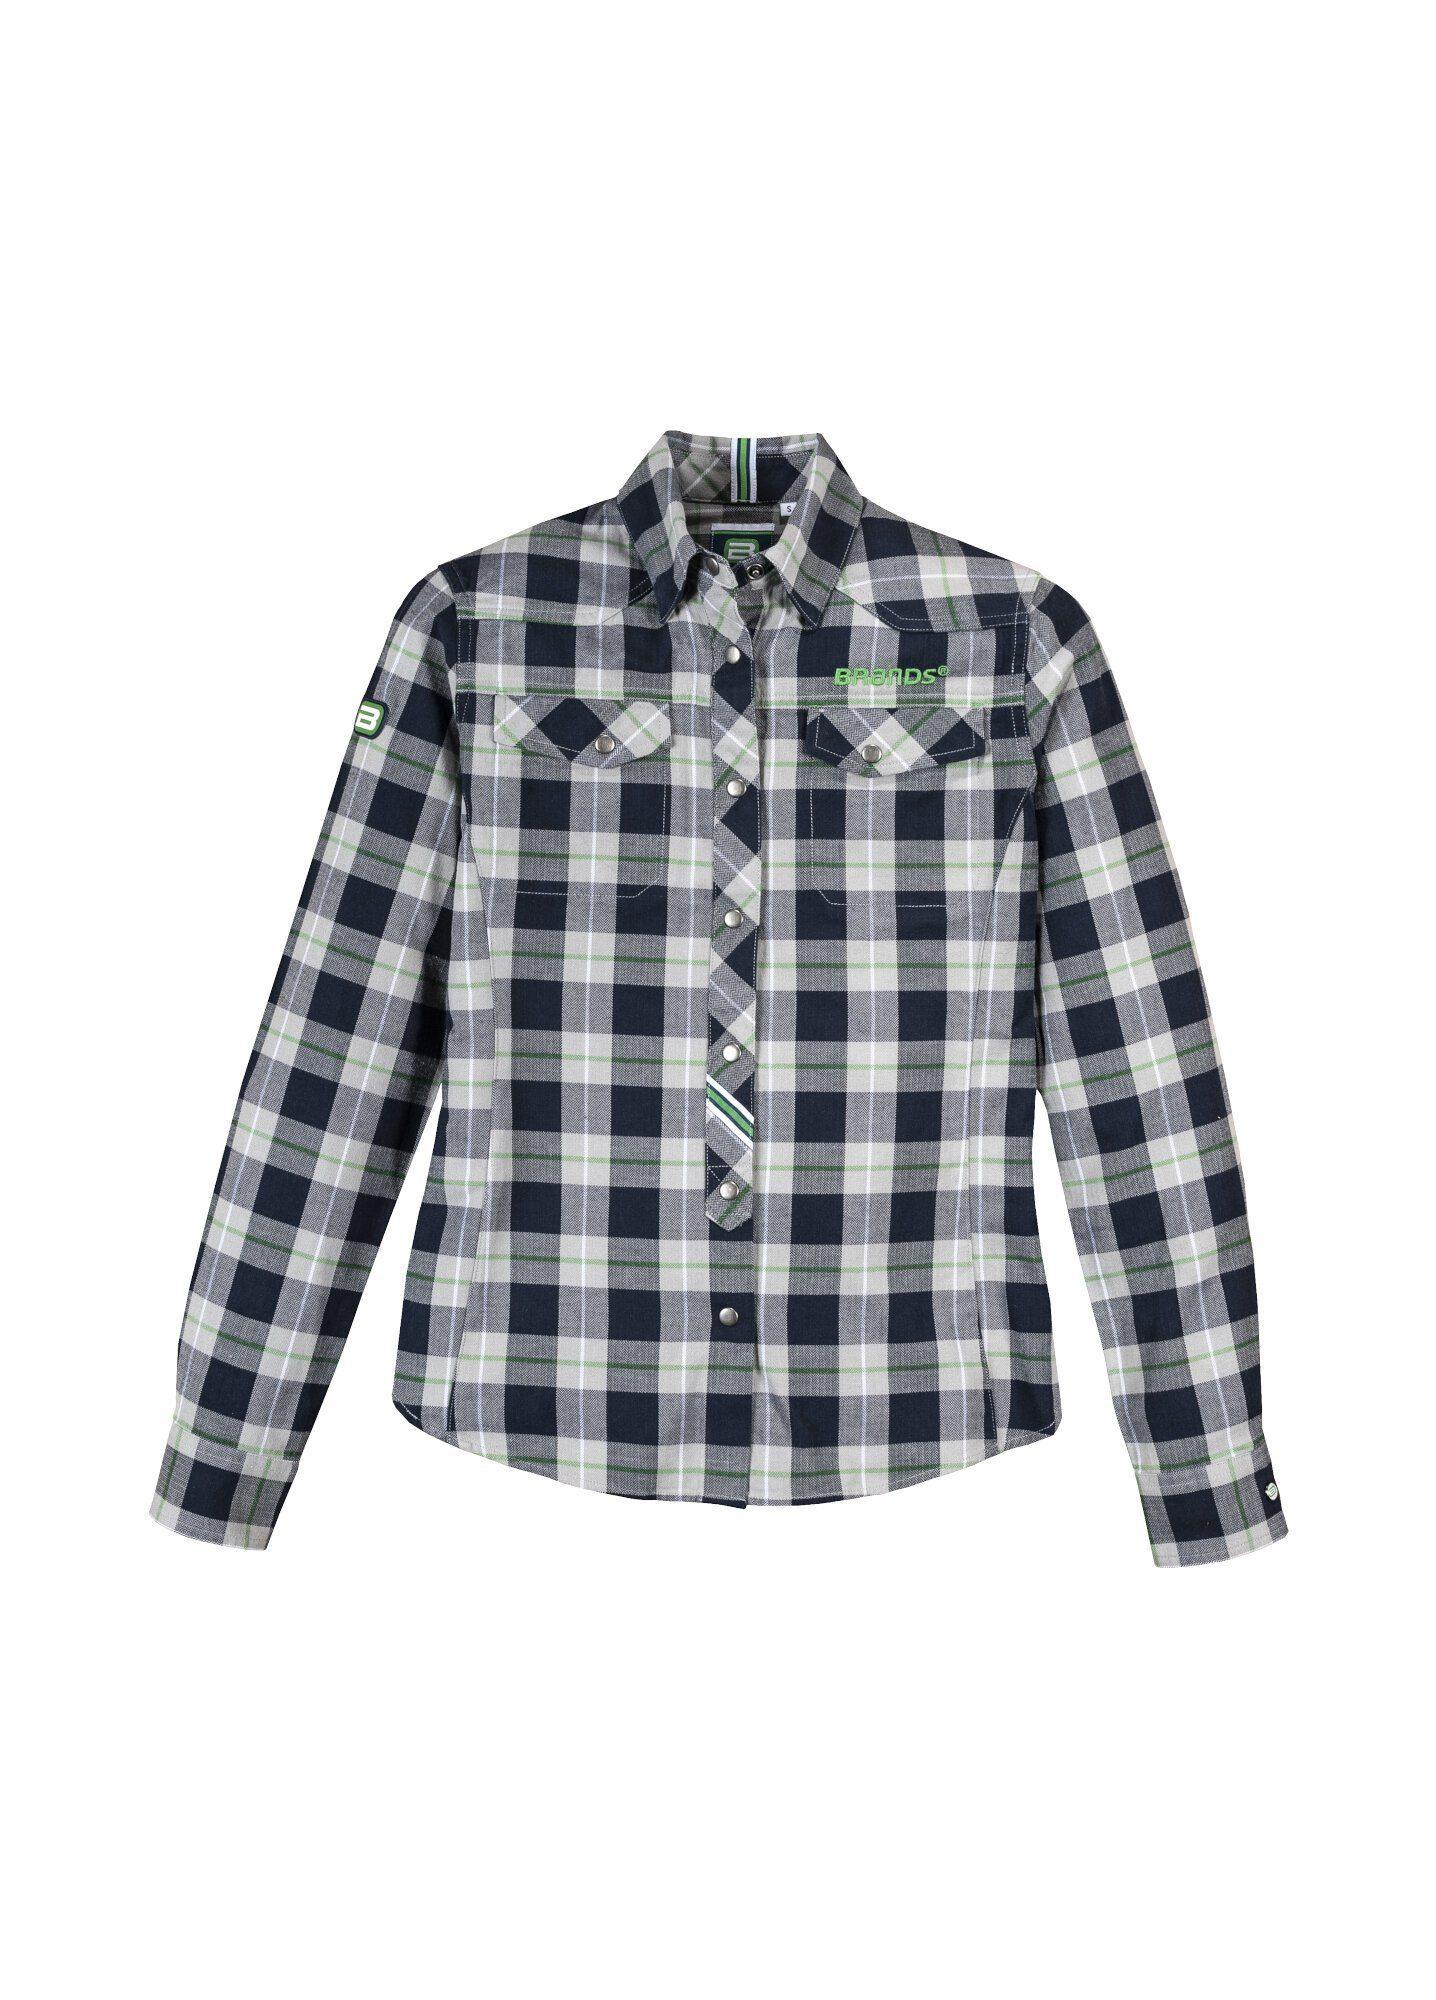 BRANDS Workwear Karobluse Karobluse Damen GOTS | Bekleidung > Blusen > Karoblusen | Brands Workwear